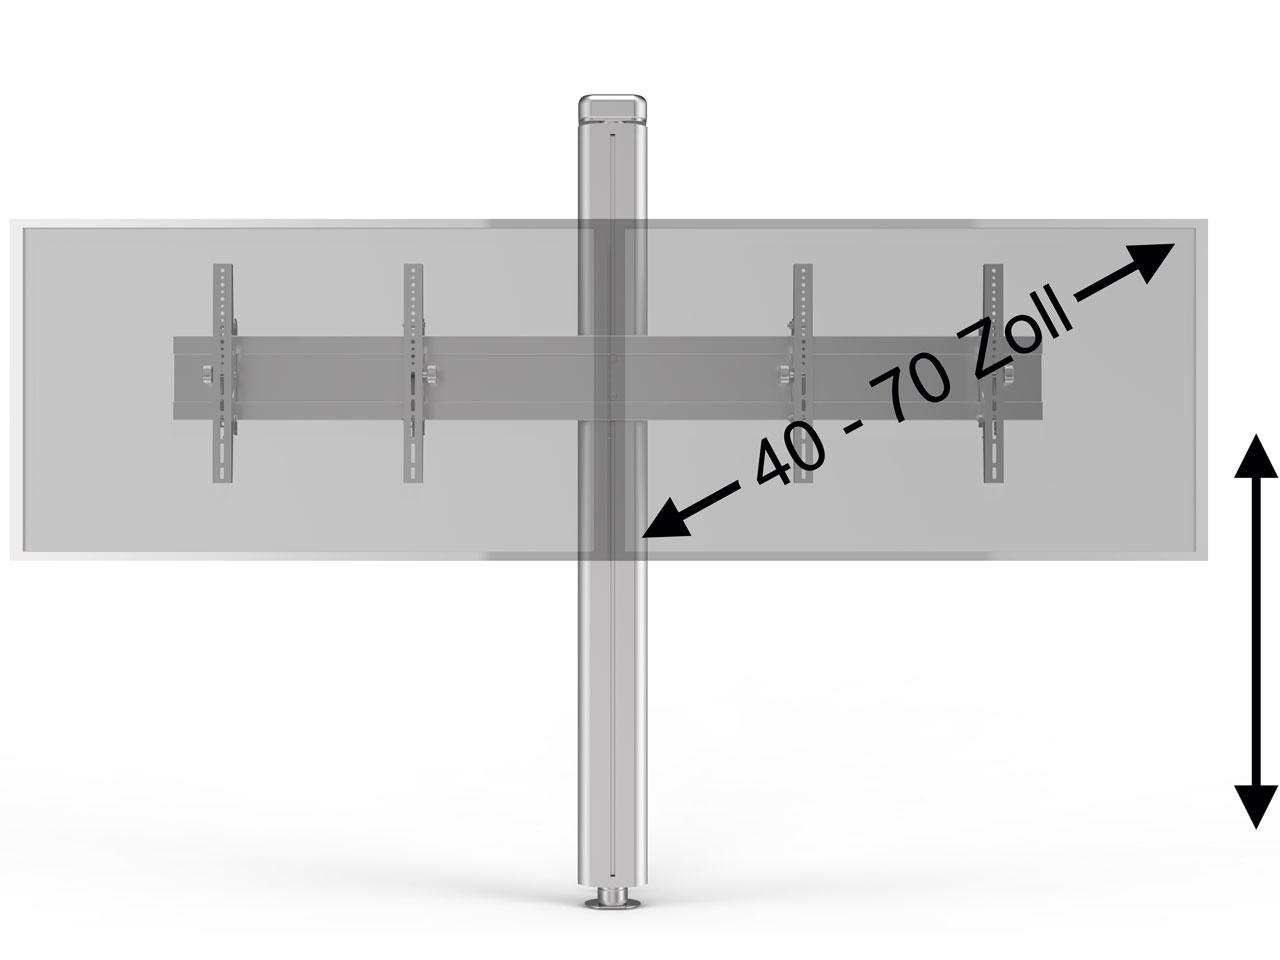 boden wand tv s ulenhalter silber f r 2 bildschirme 40 70 zoll g nstig kaufen cmb systeme. Black Bedroom Furniture Sets. Home Design Ideas